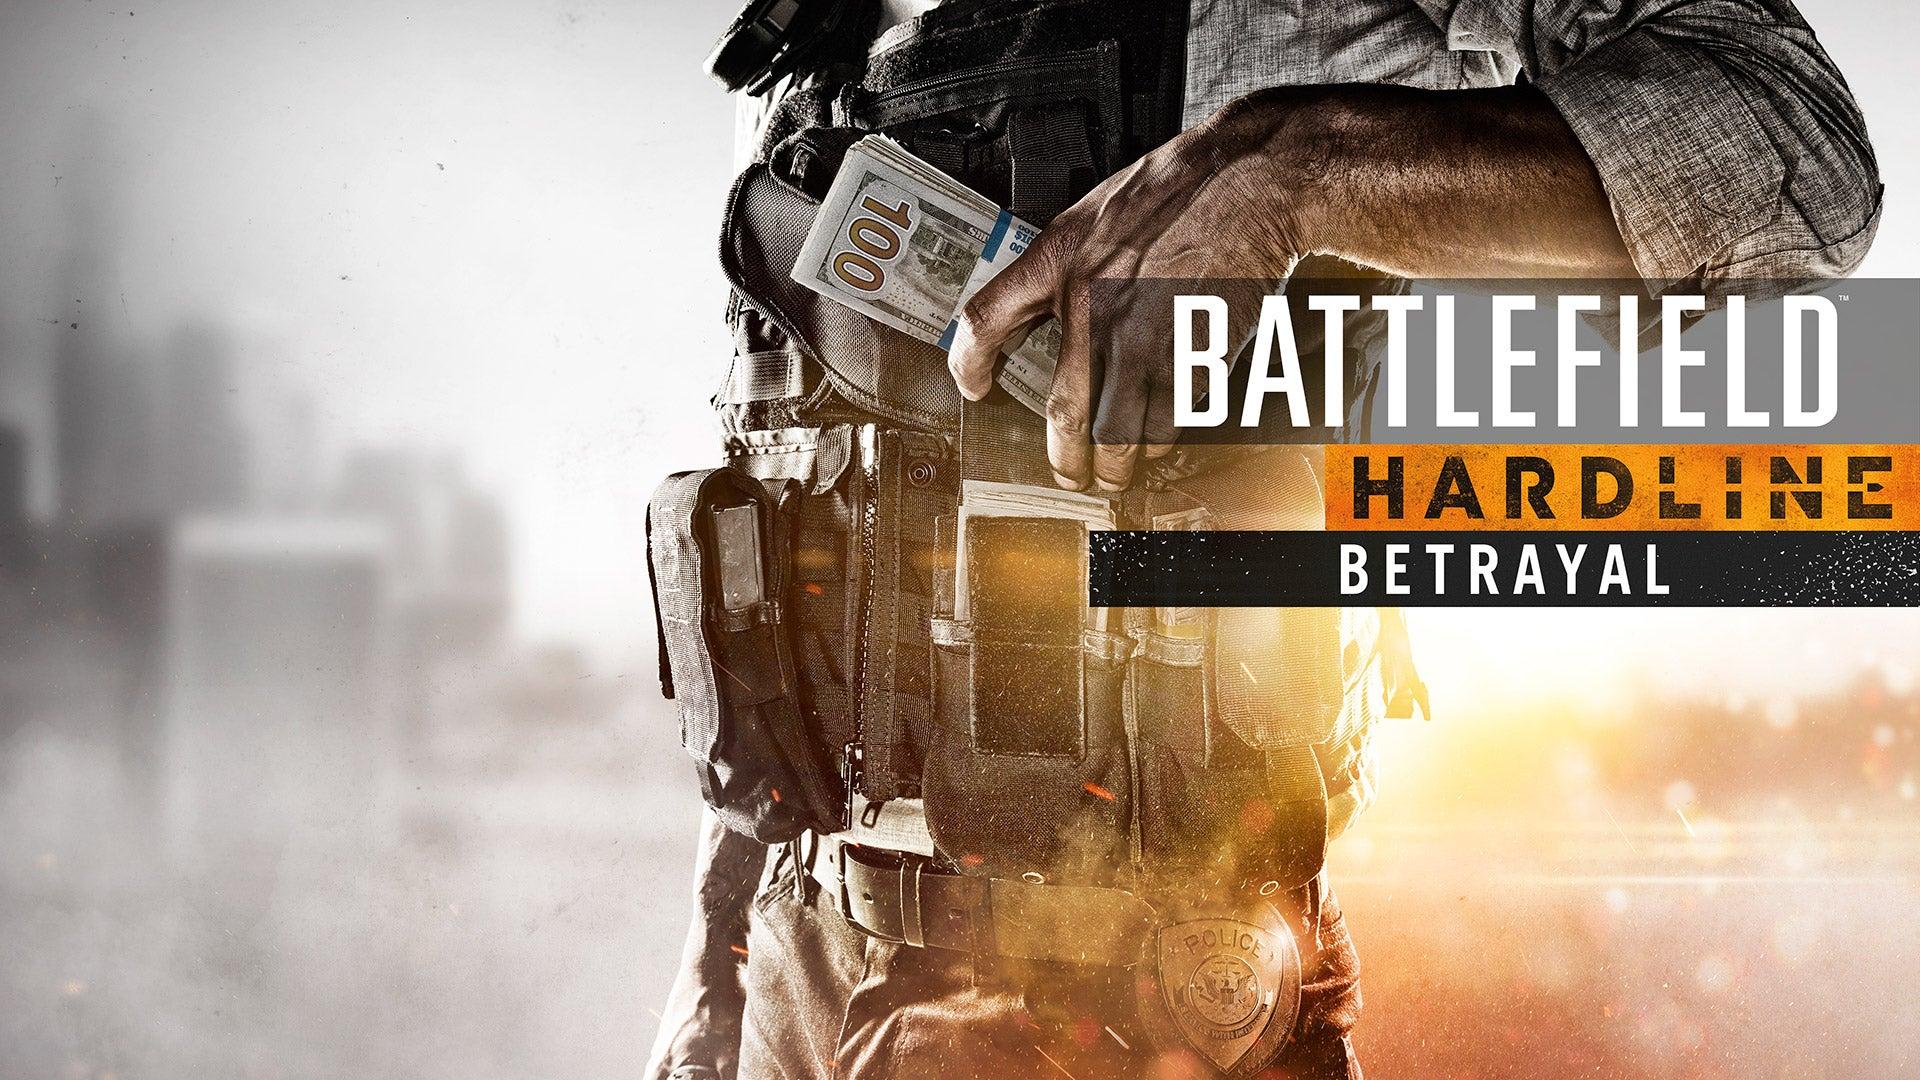 Image for Battlefield Hardline Betrayal DLC gets release date, fan-produced trailer